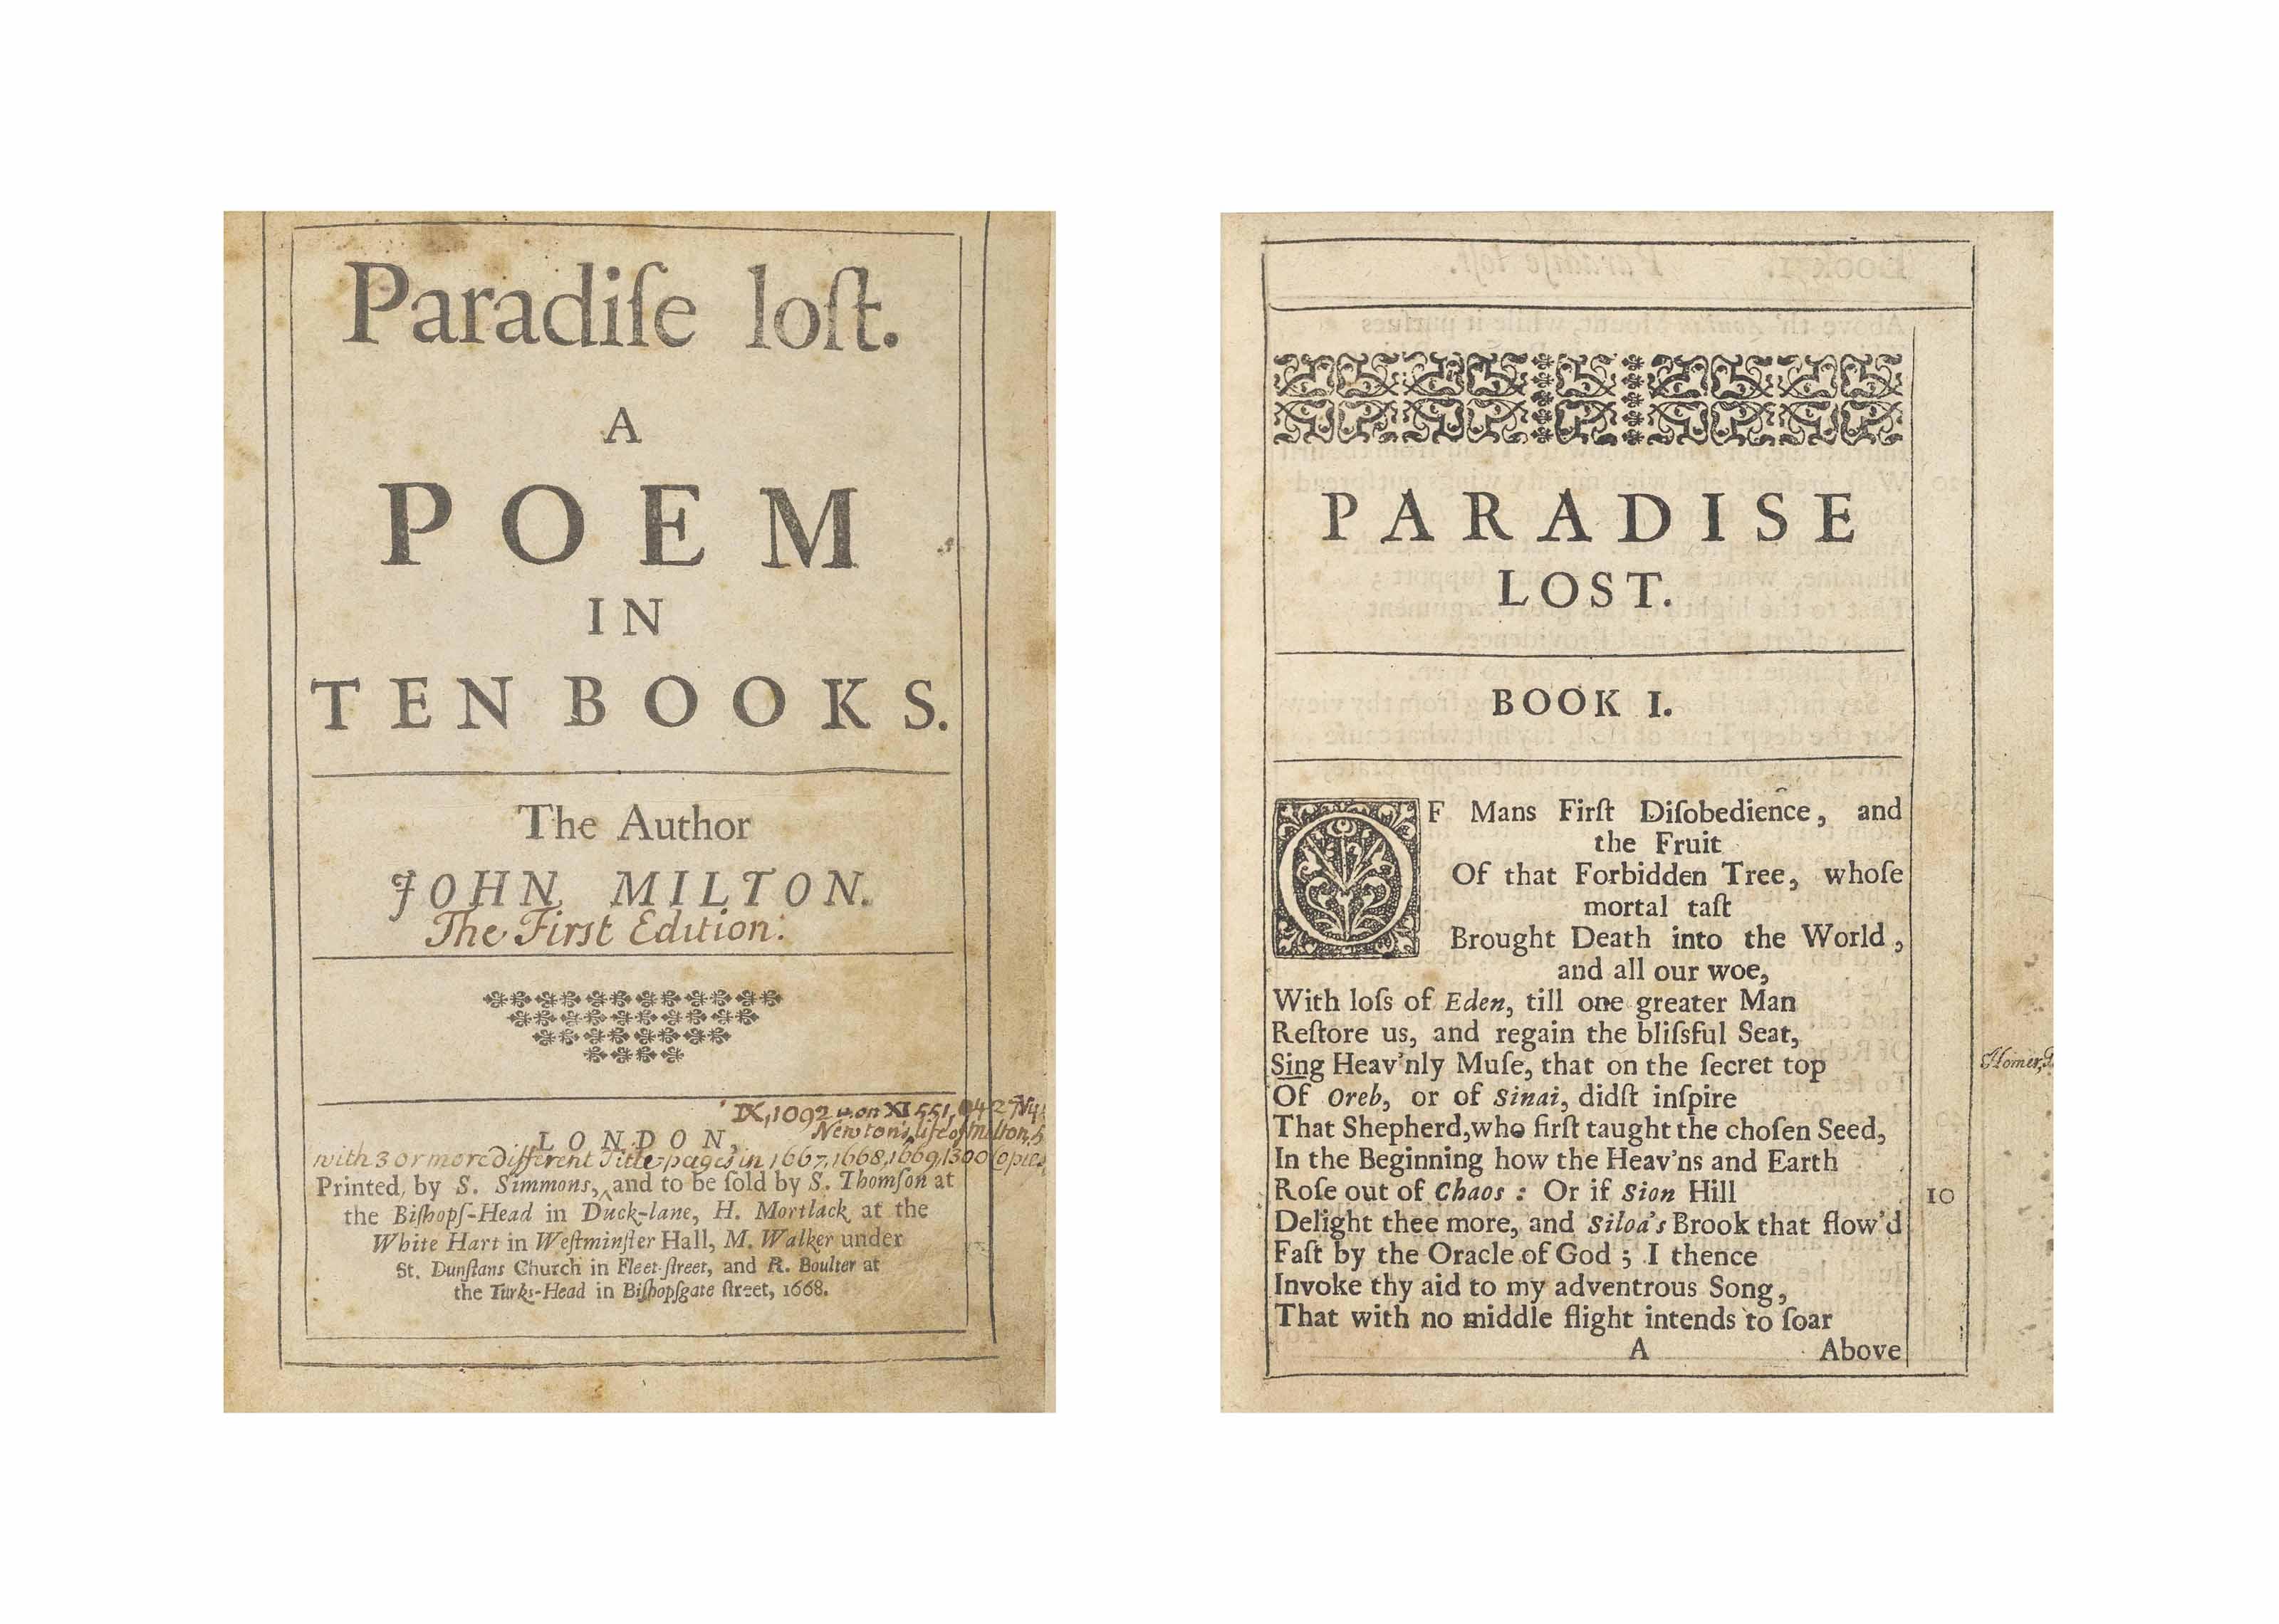 paradise lost poem